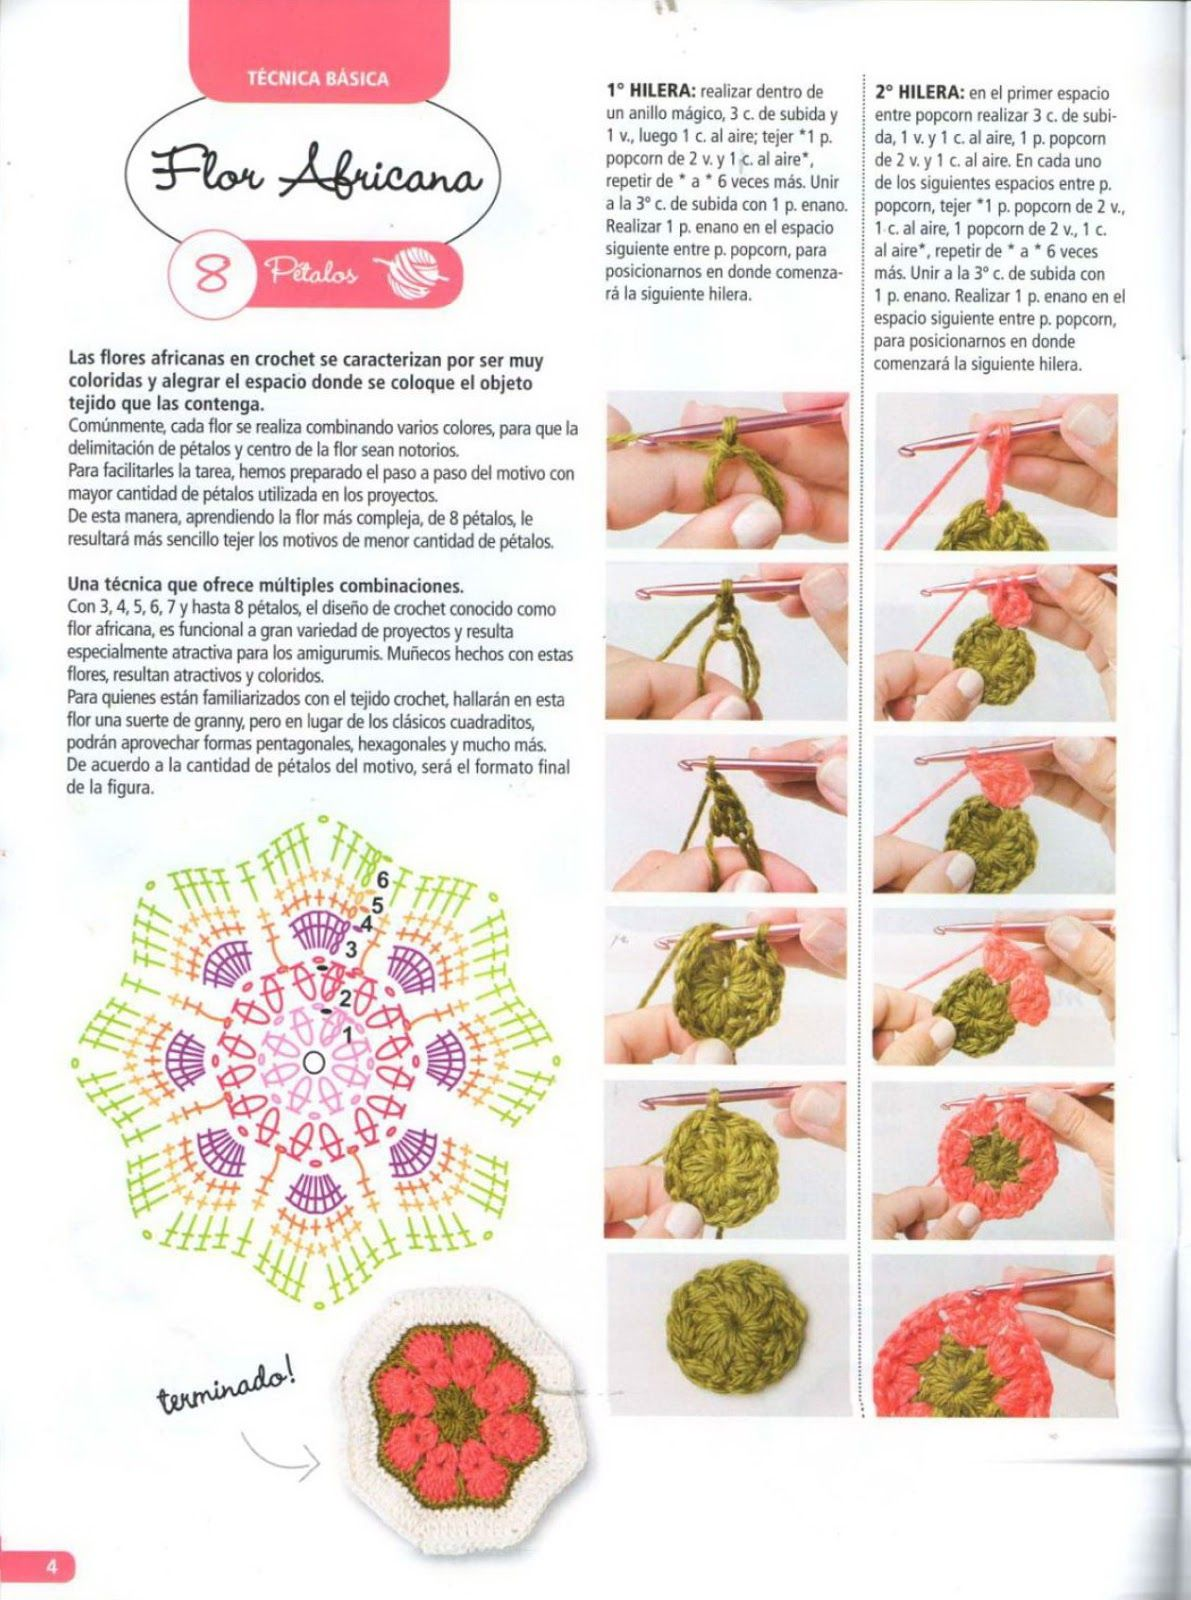 Pin de Else en Gratis mønster | Pinterest | Revistas de manualidades ...